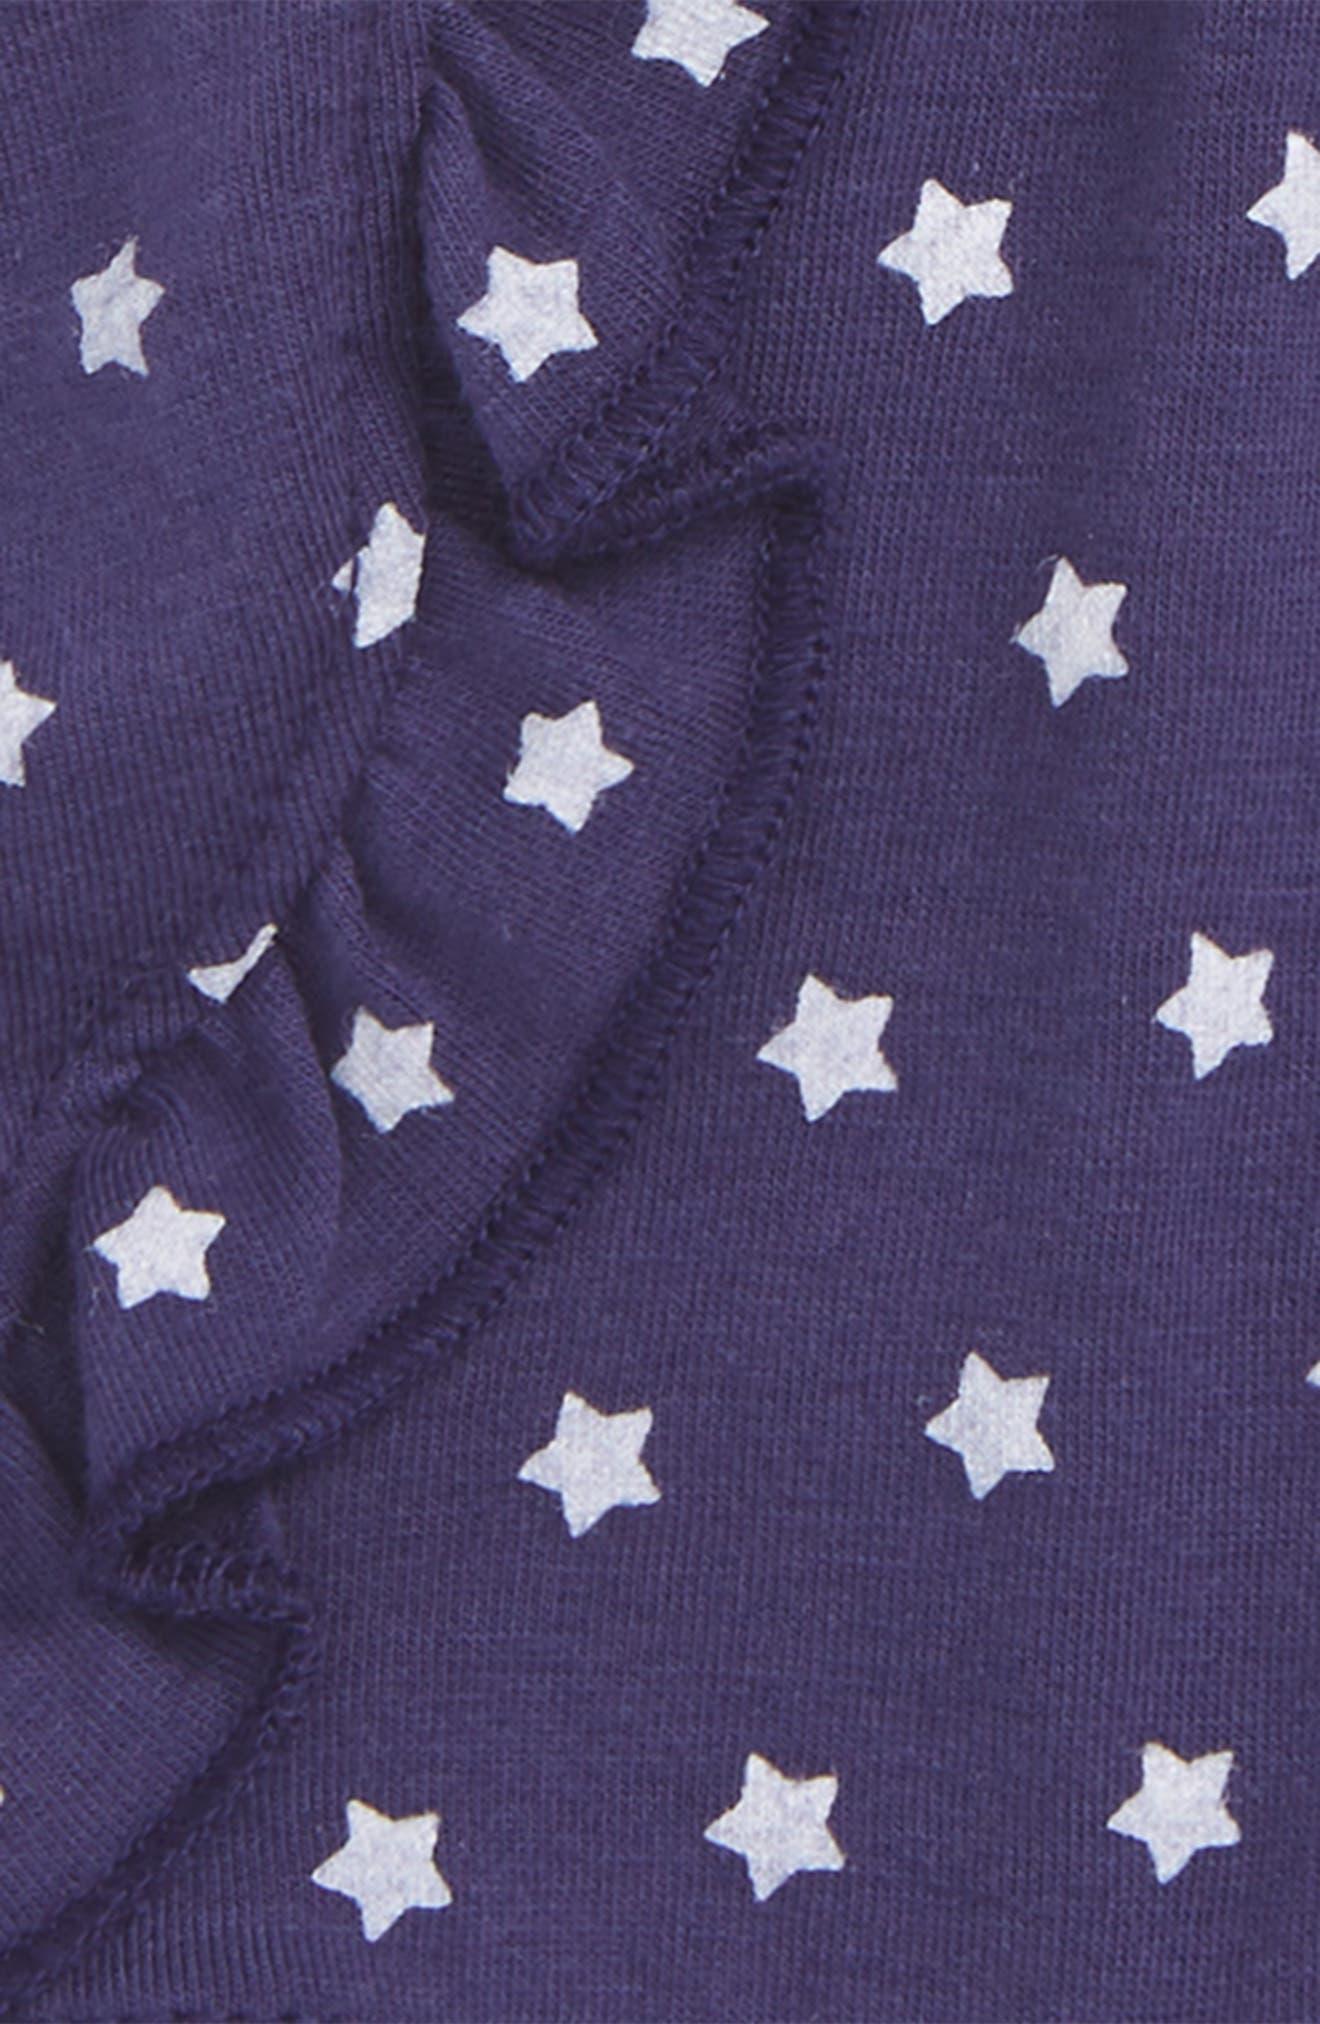 Star Print Ruffle Shorts,                             Alternate thumbnail 2, color,                             Navy Ribbon Stars